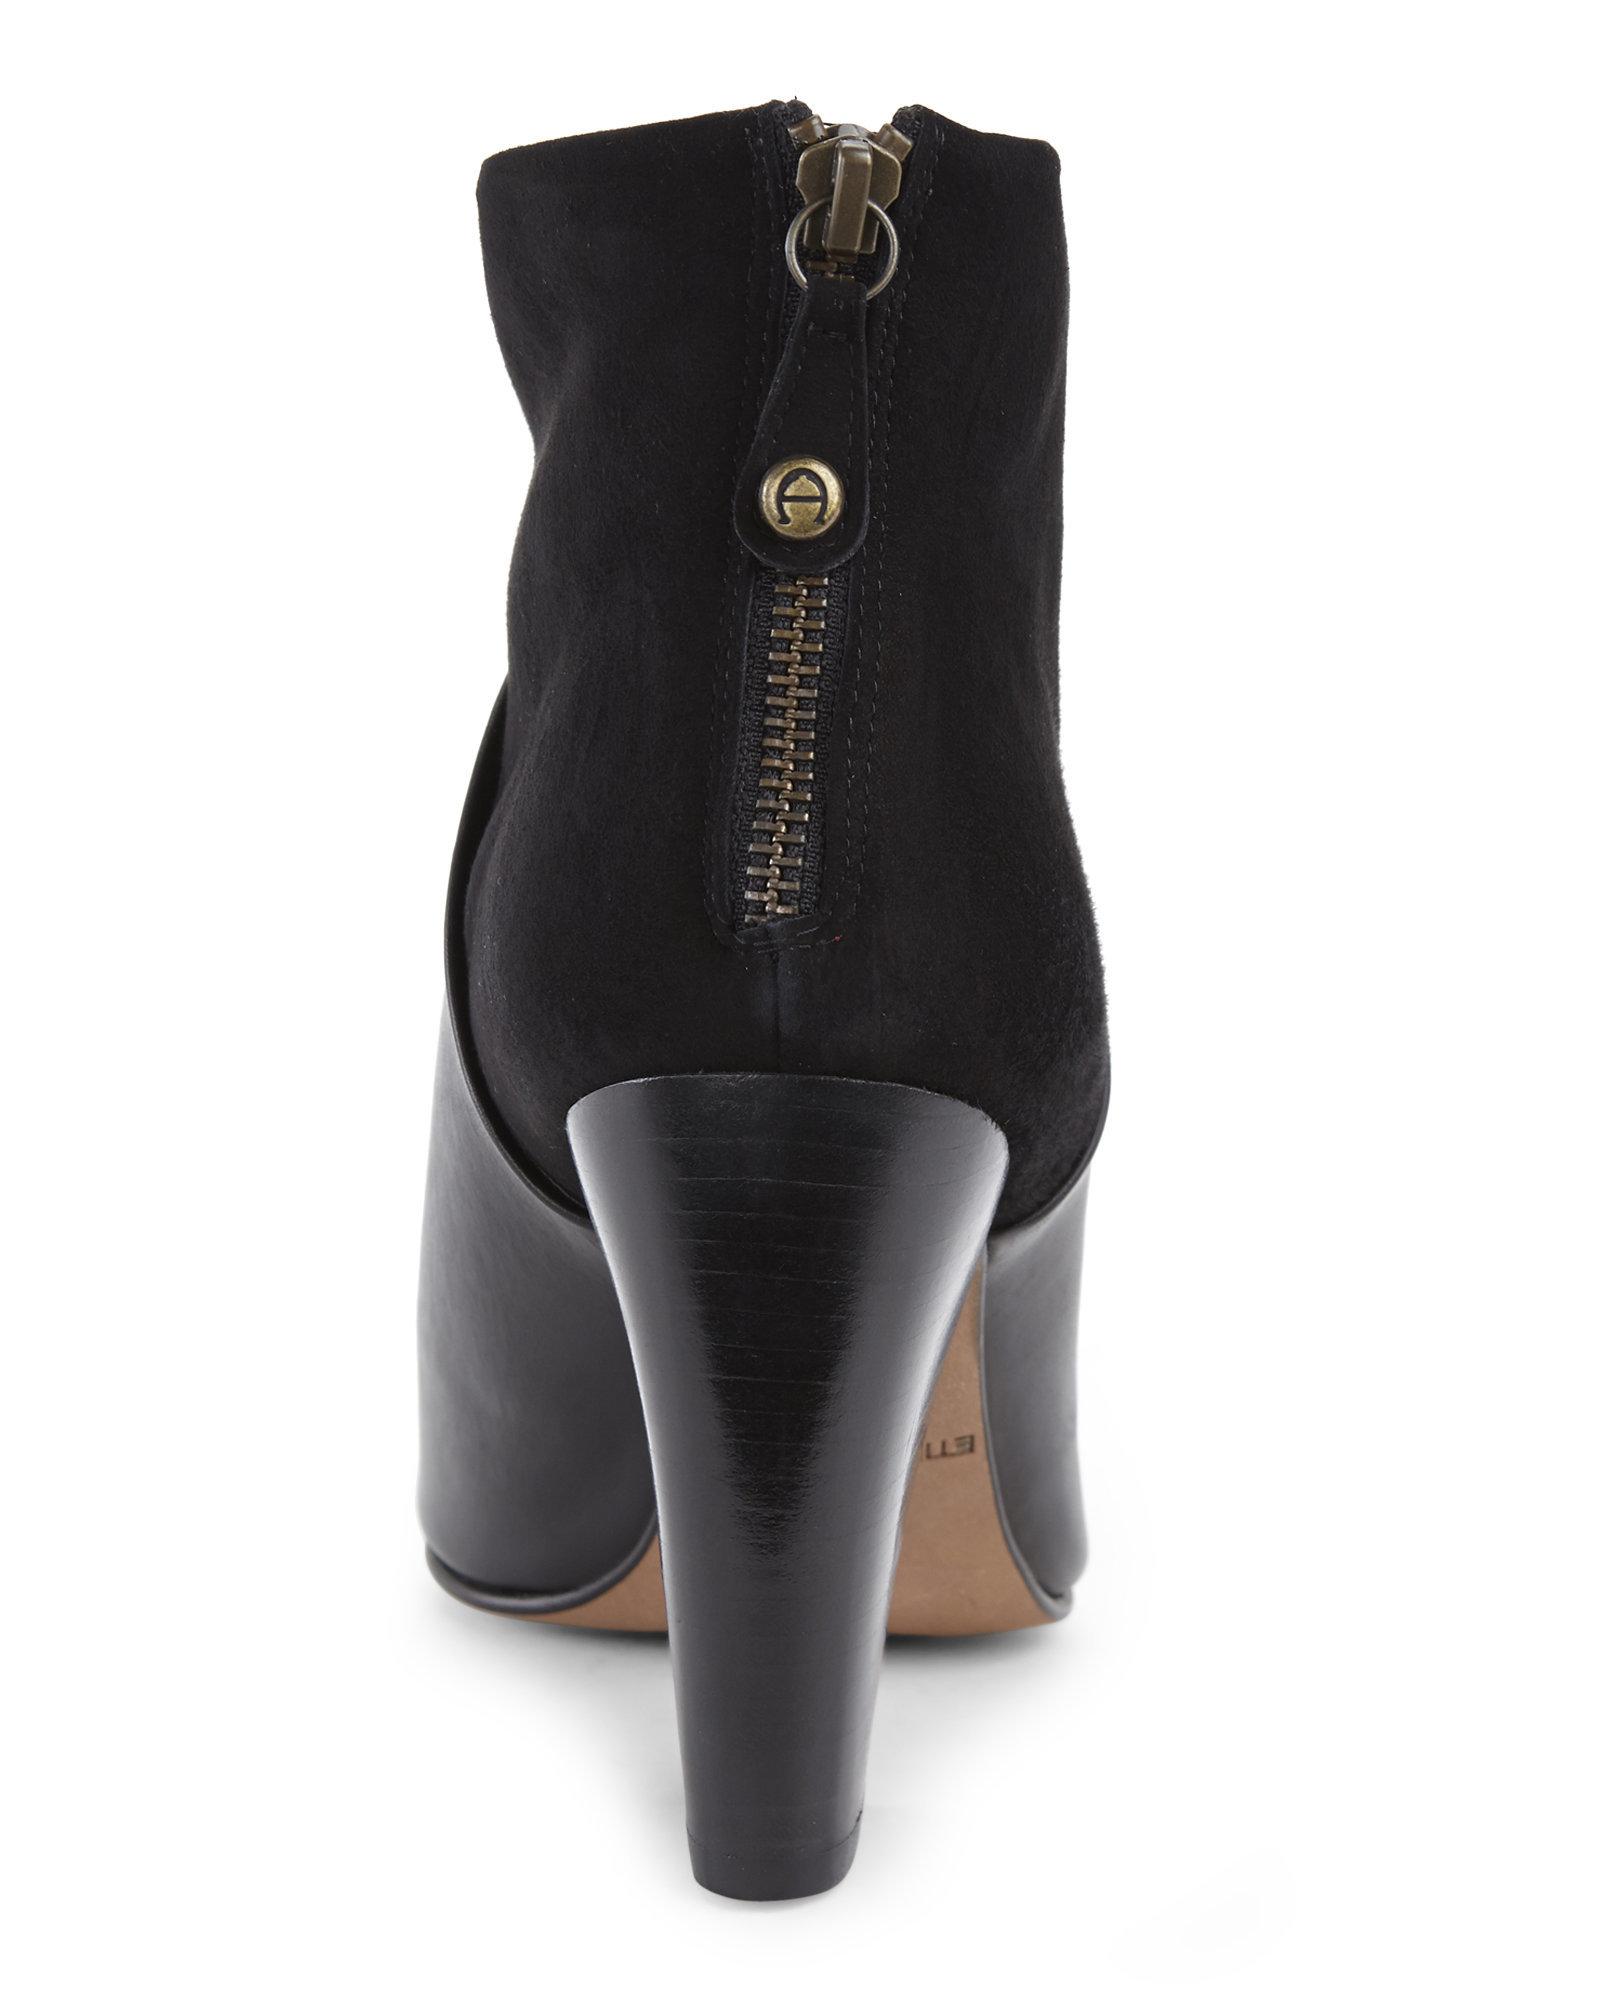 Etienne aigner black leather gloves - Gallery